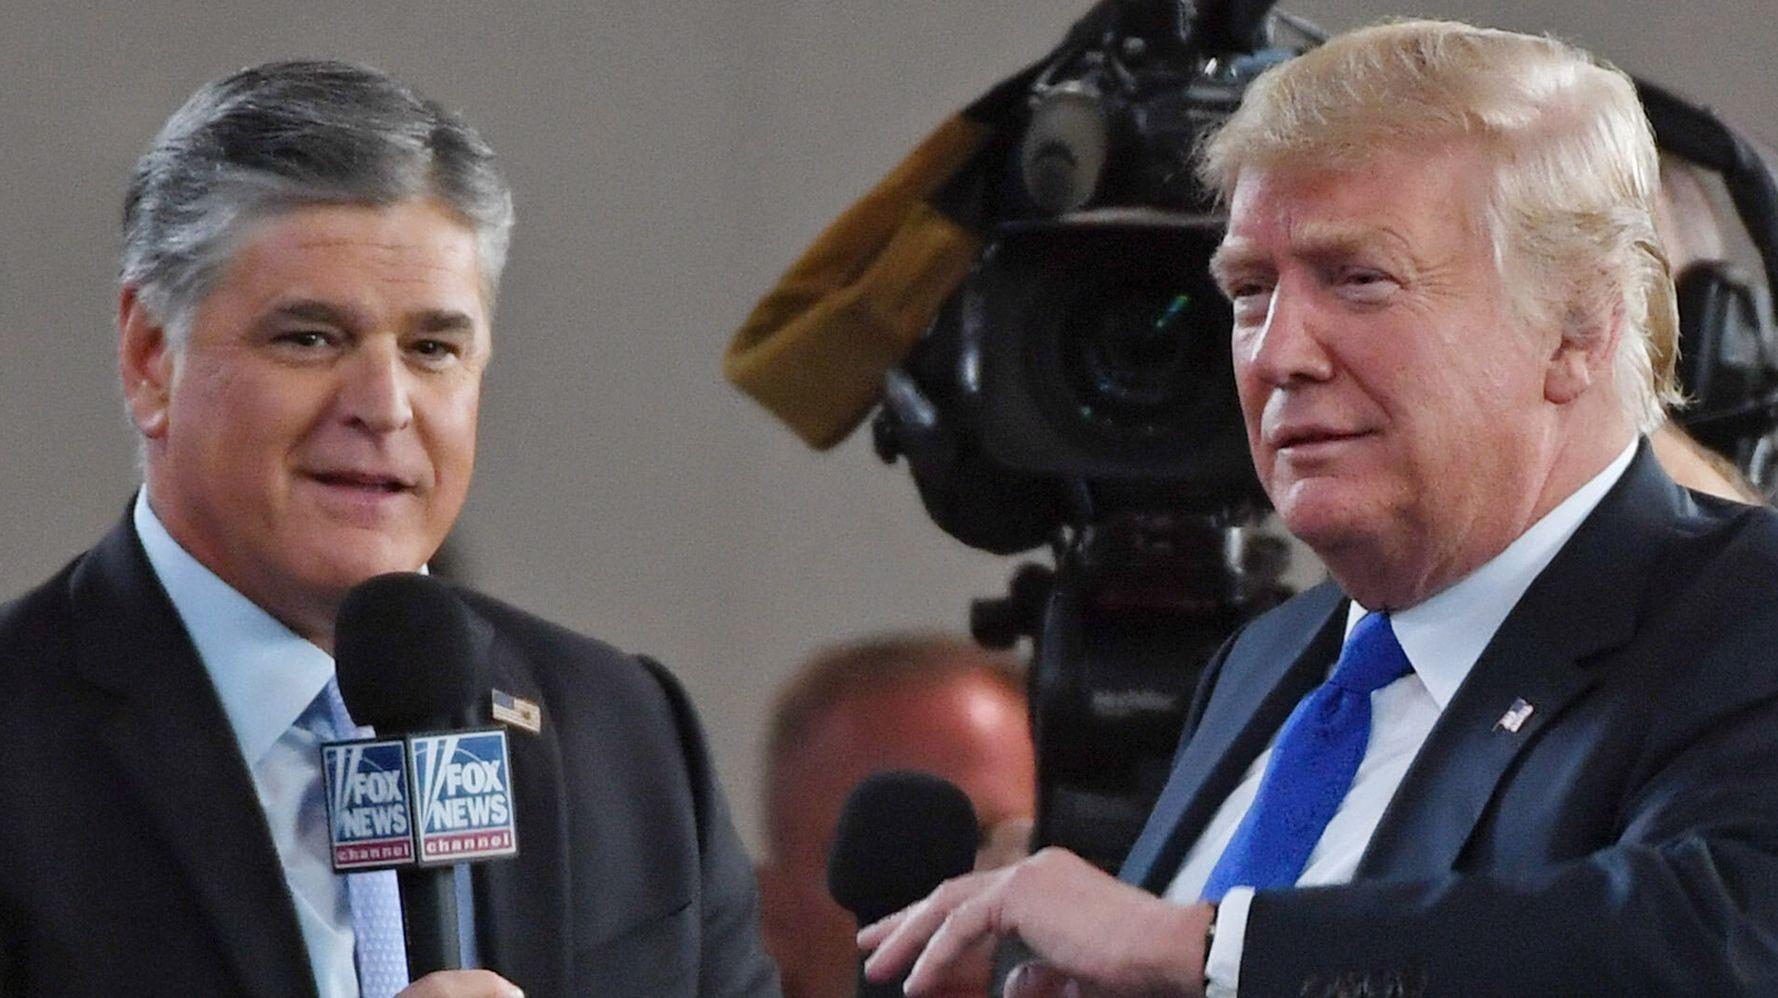 Sean Hannity Spends $5 Million On Townhouse Near Donald Trump's Mar-A-Lago